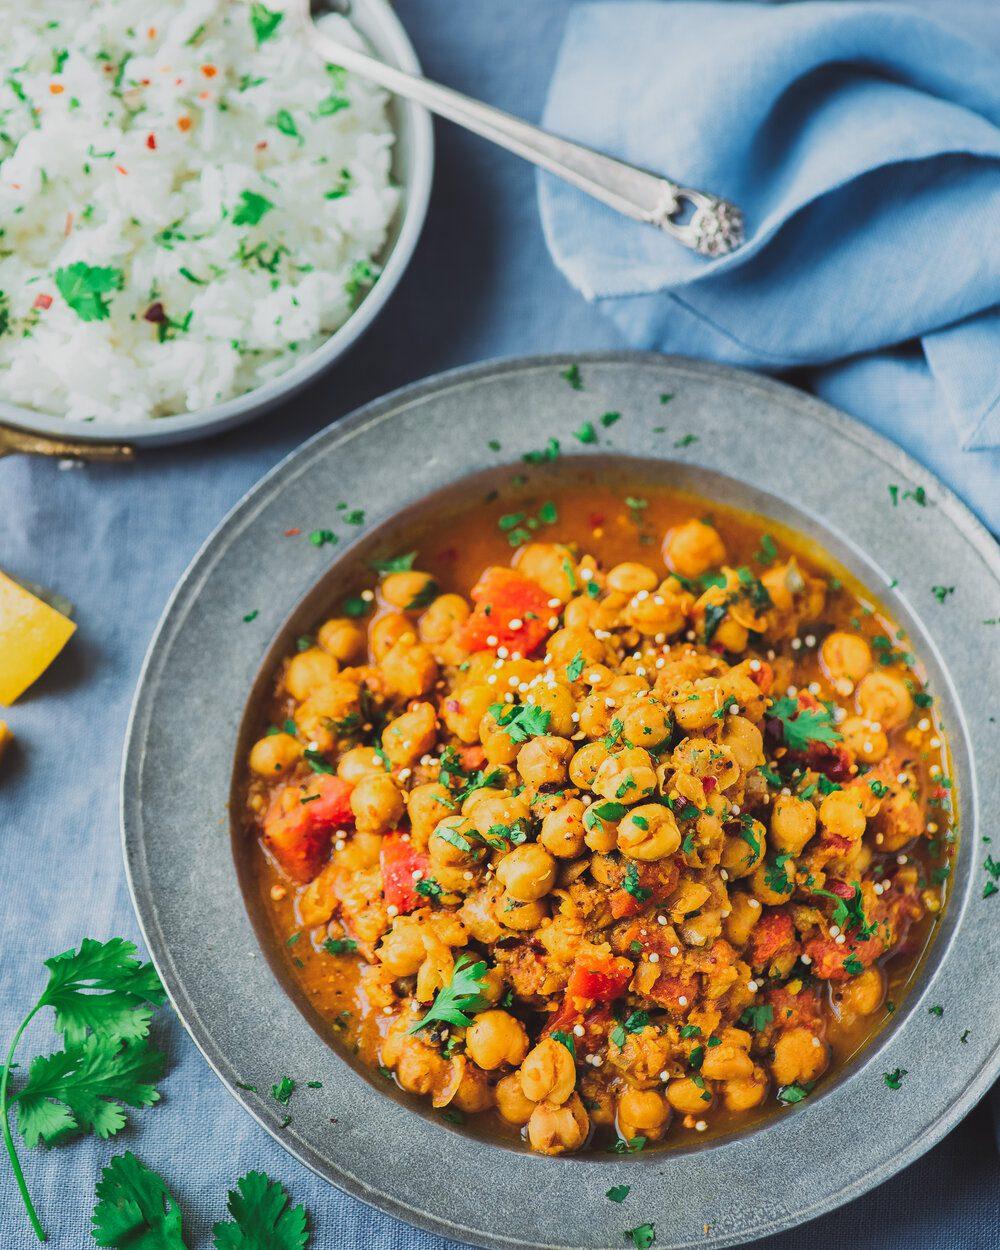 Healthy Vegan Instant Pot Recipes to Make This Winter. Instant Pot Chana Masala.